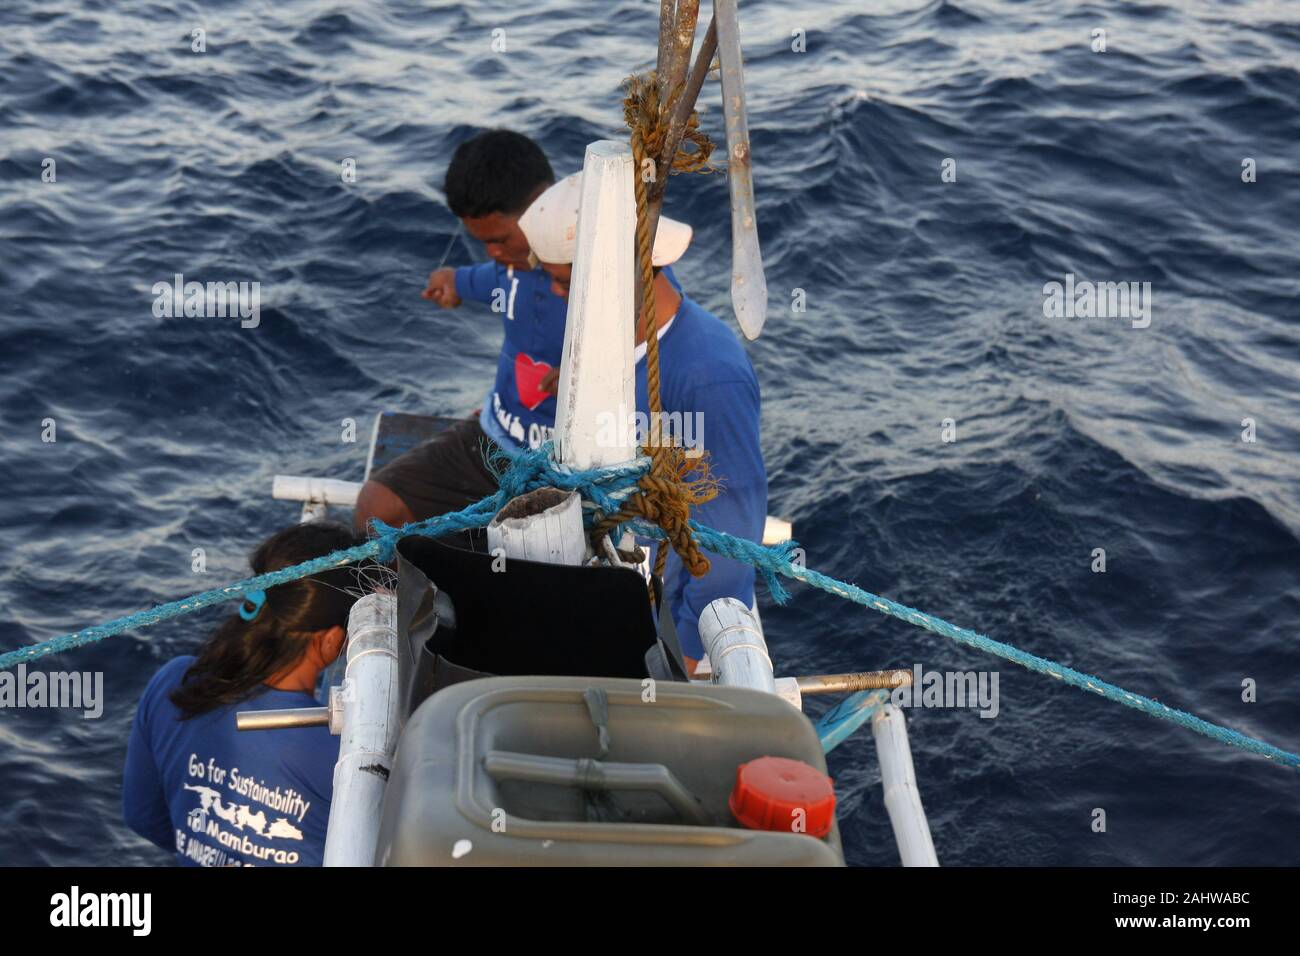 CRAB MACKEREL SEA FISHING HANDLINES